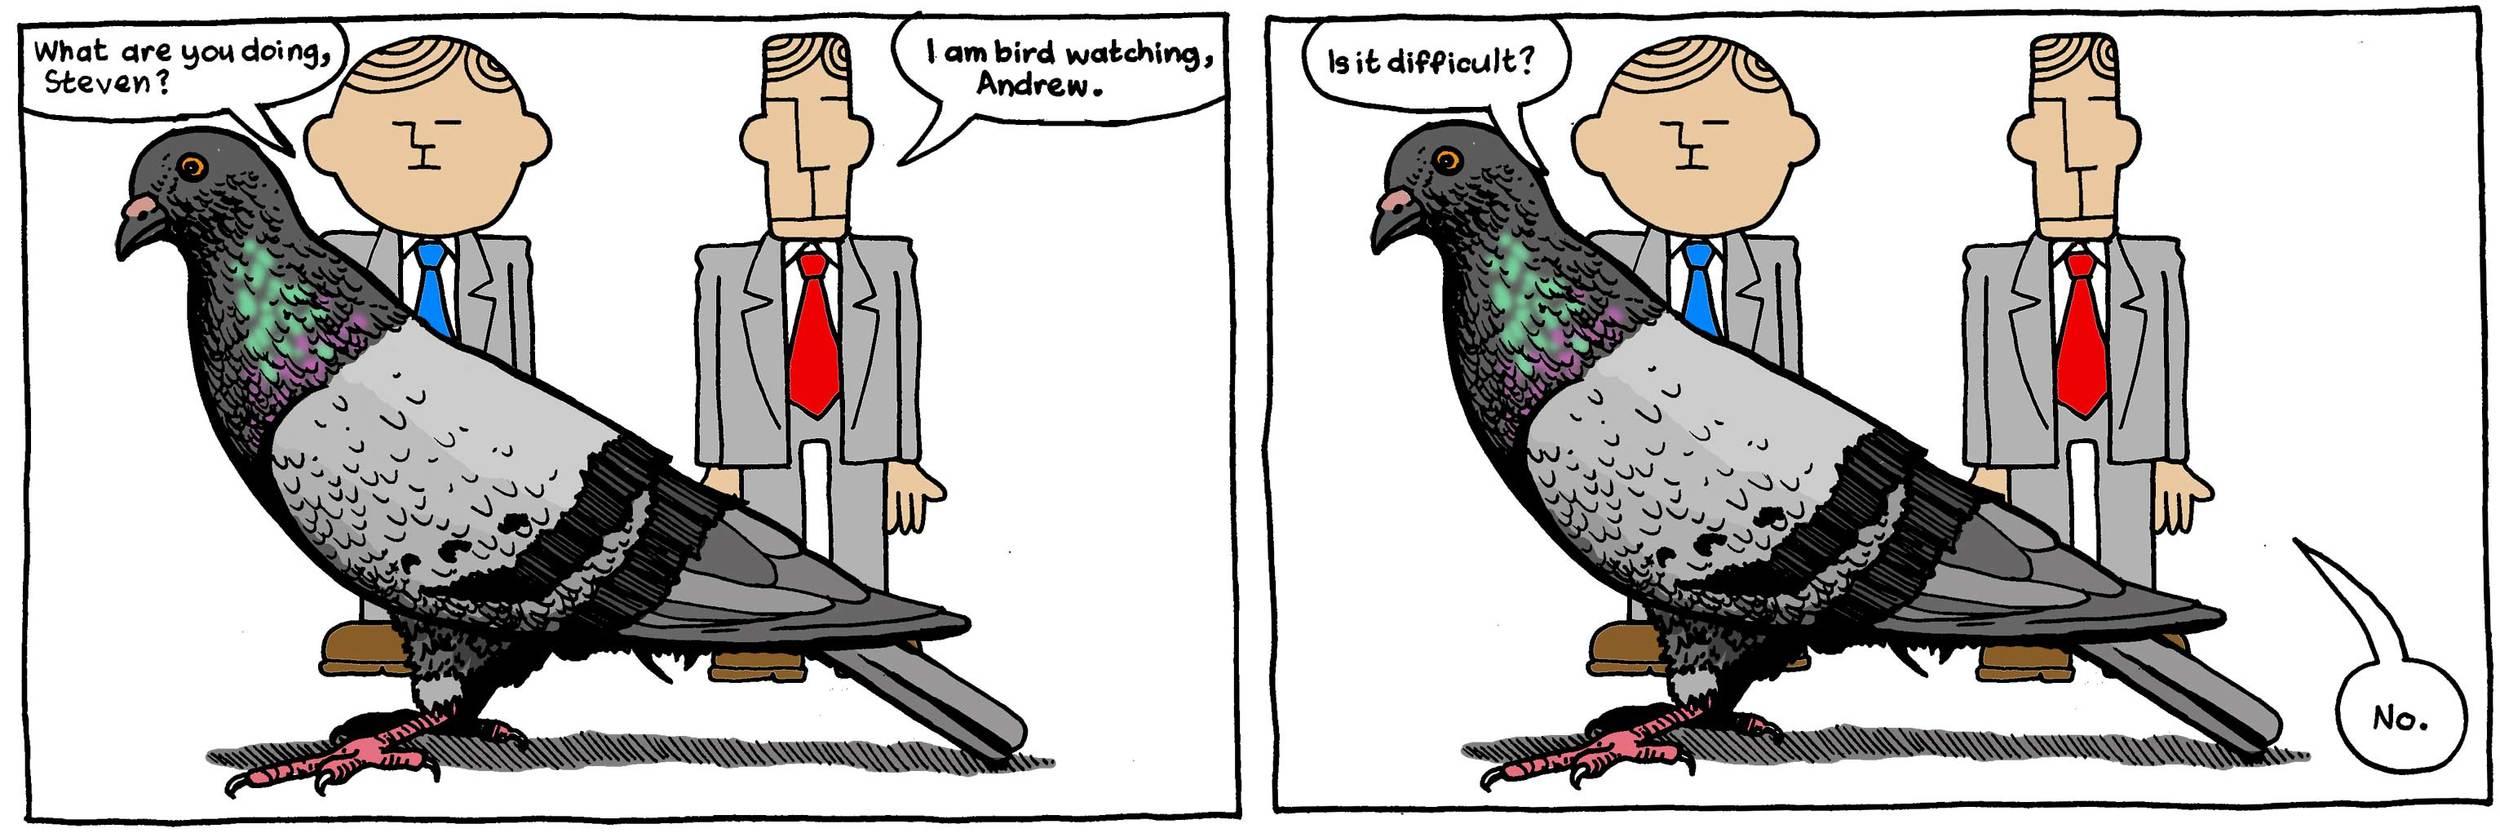 amusingbird.jpg